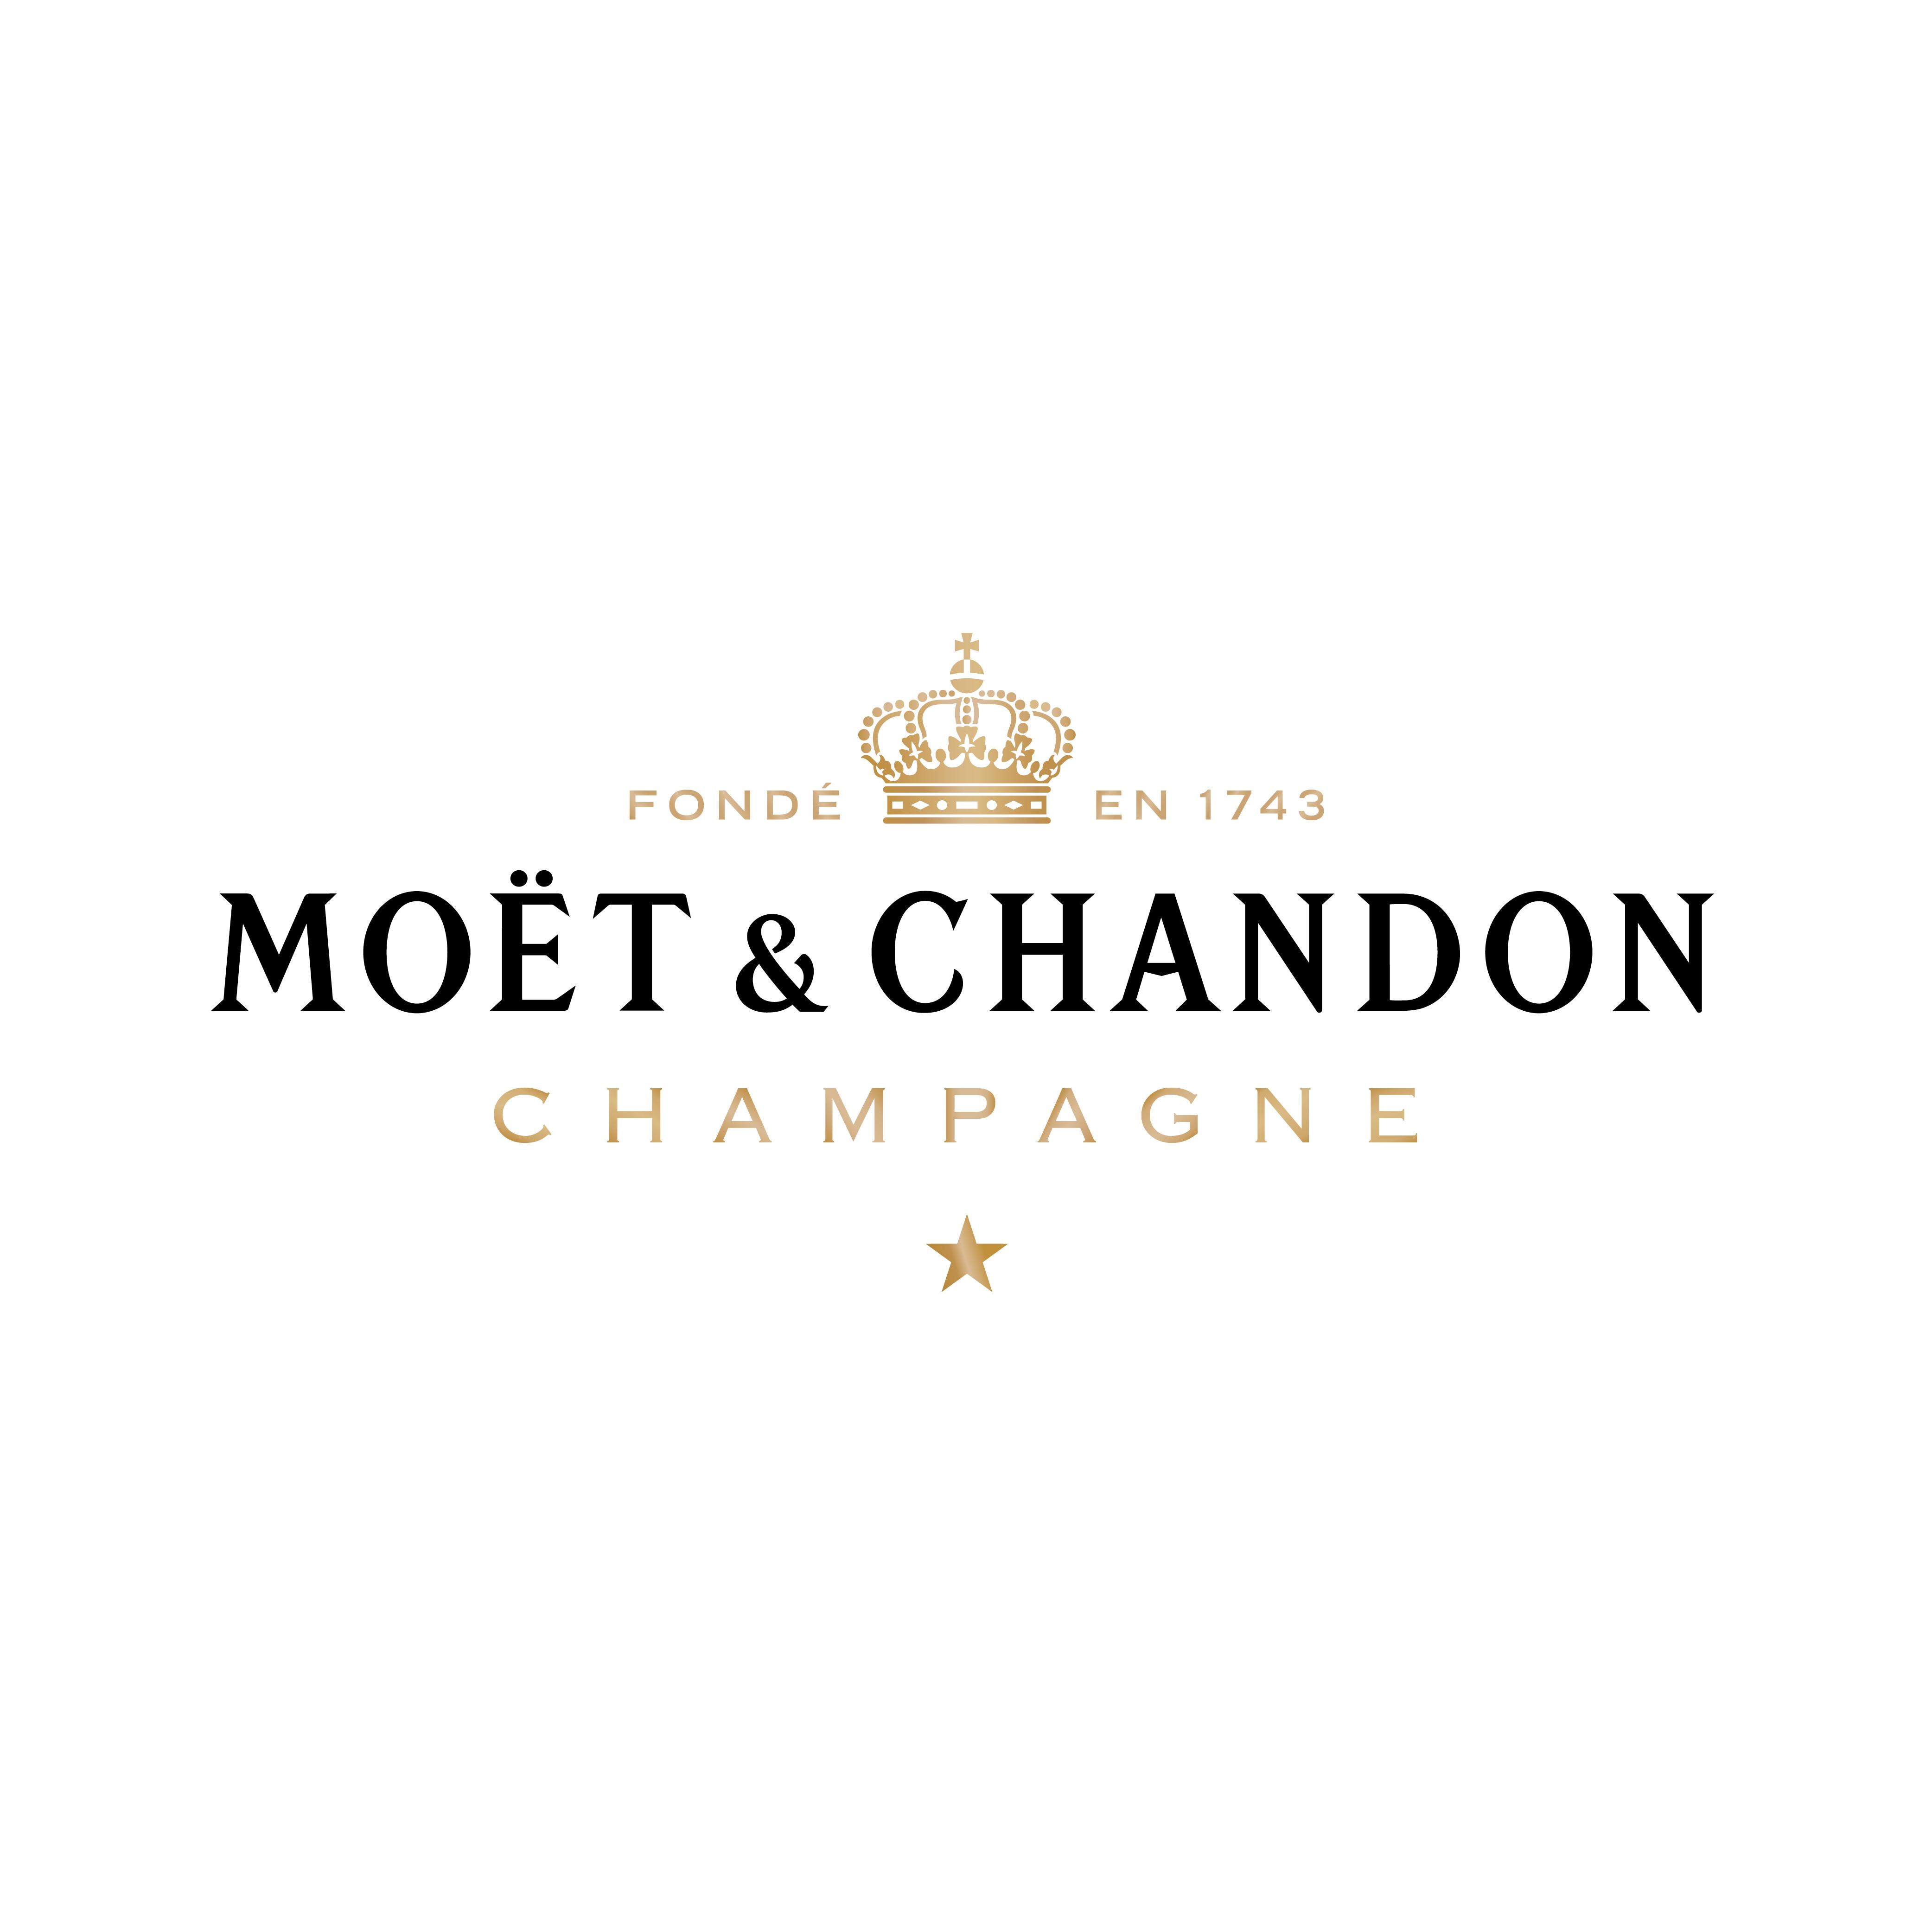 Moet & Chandon a Vinoforum